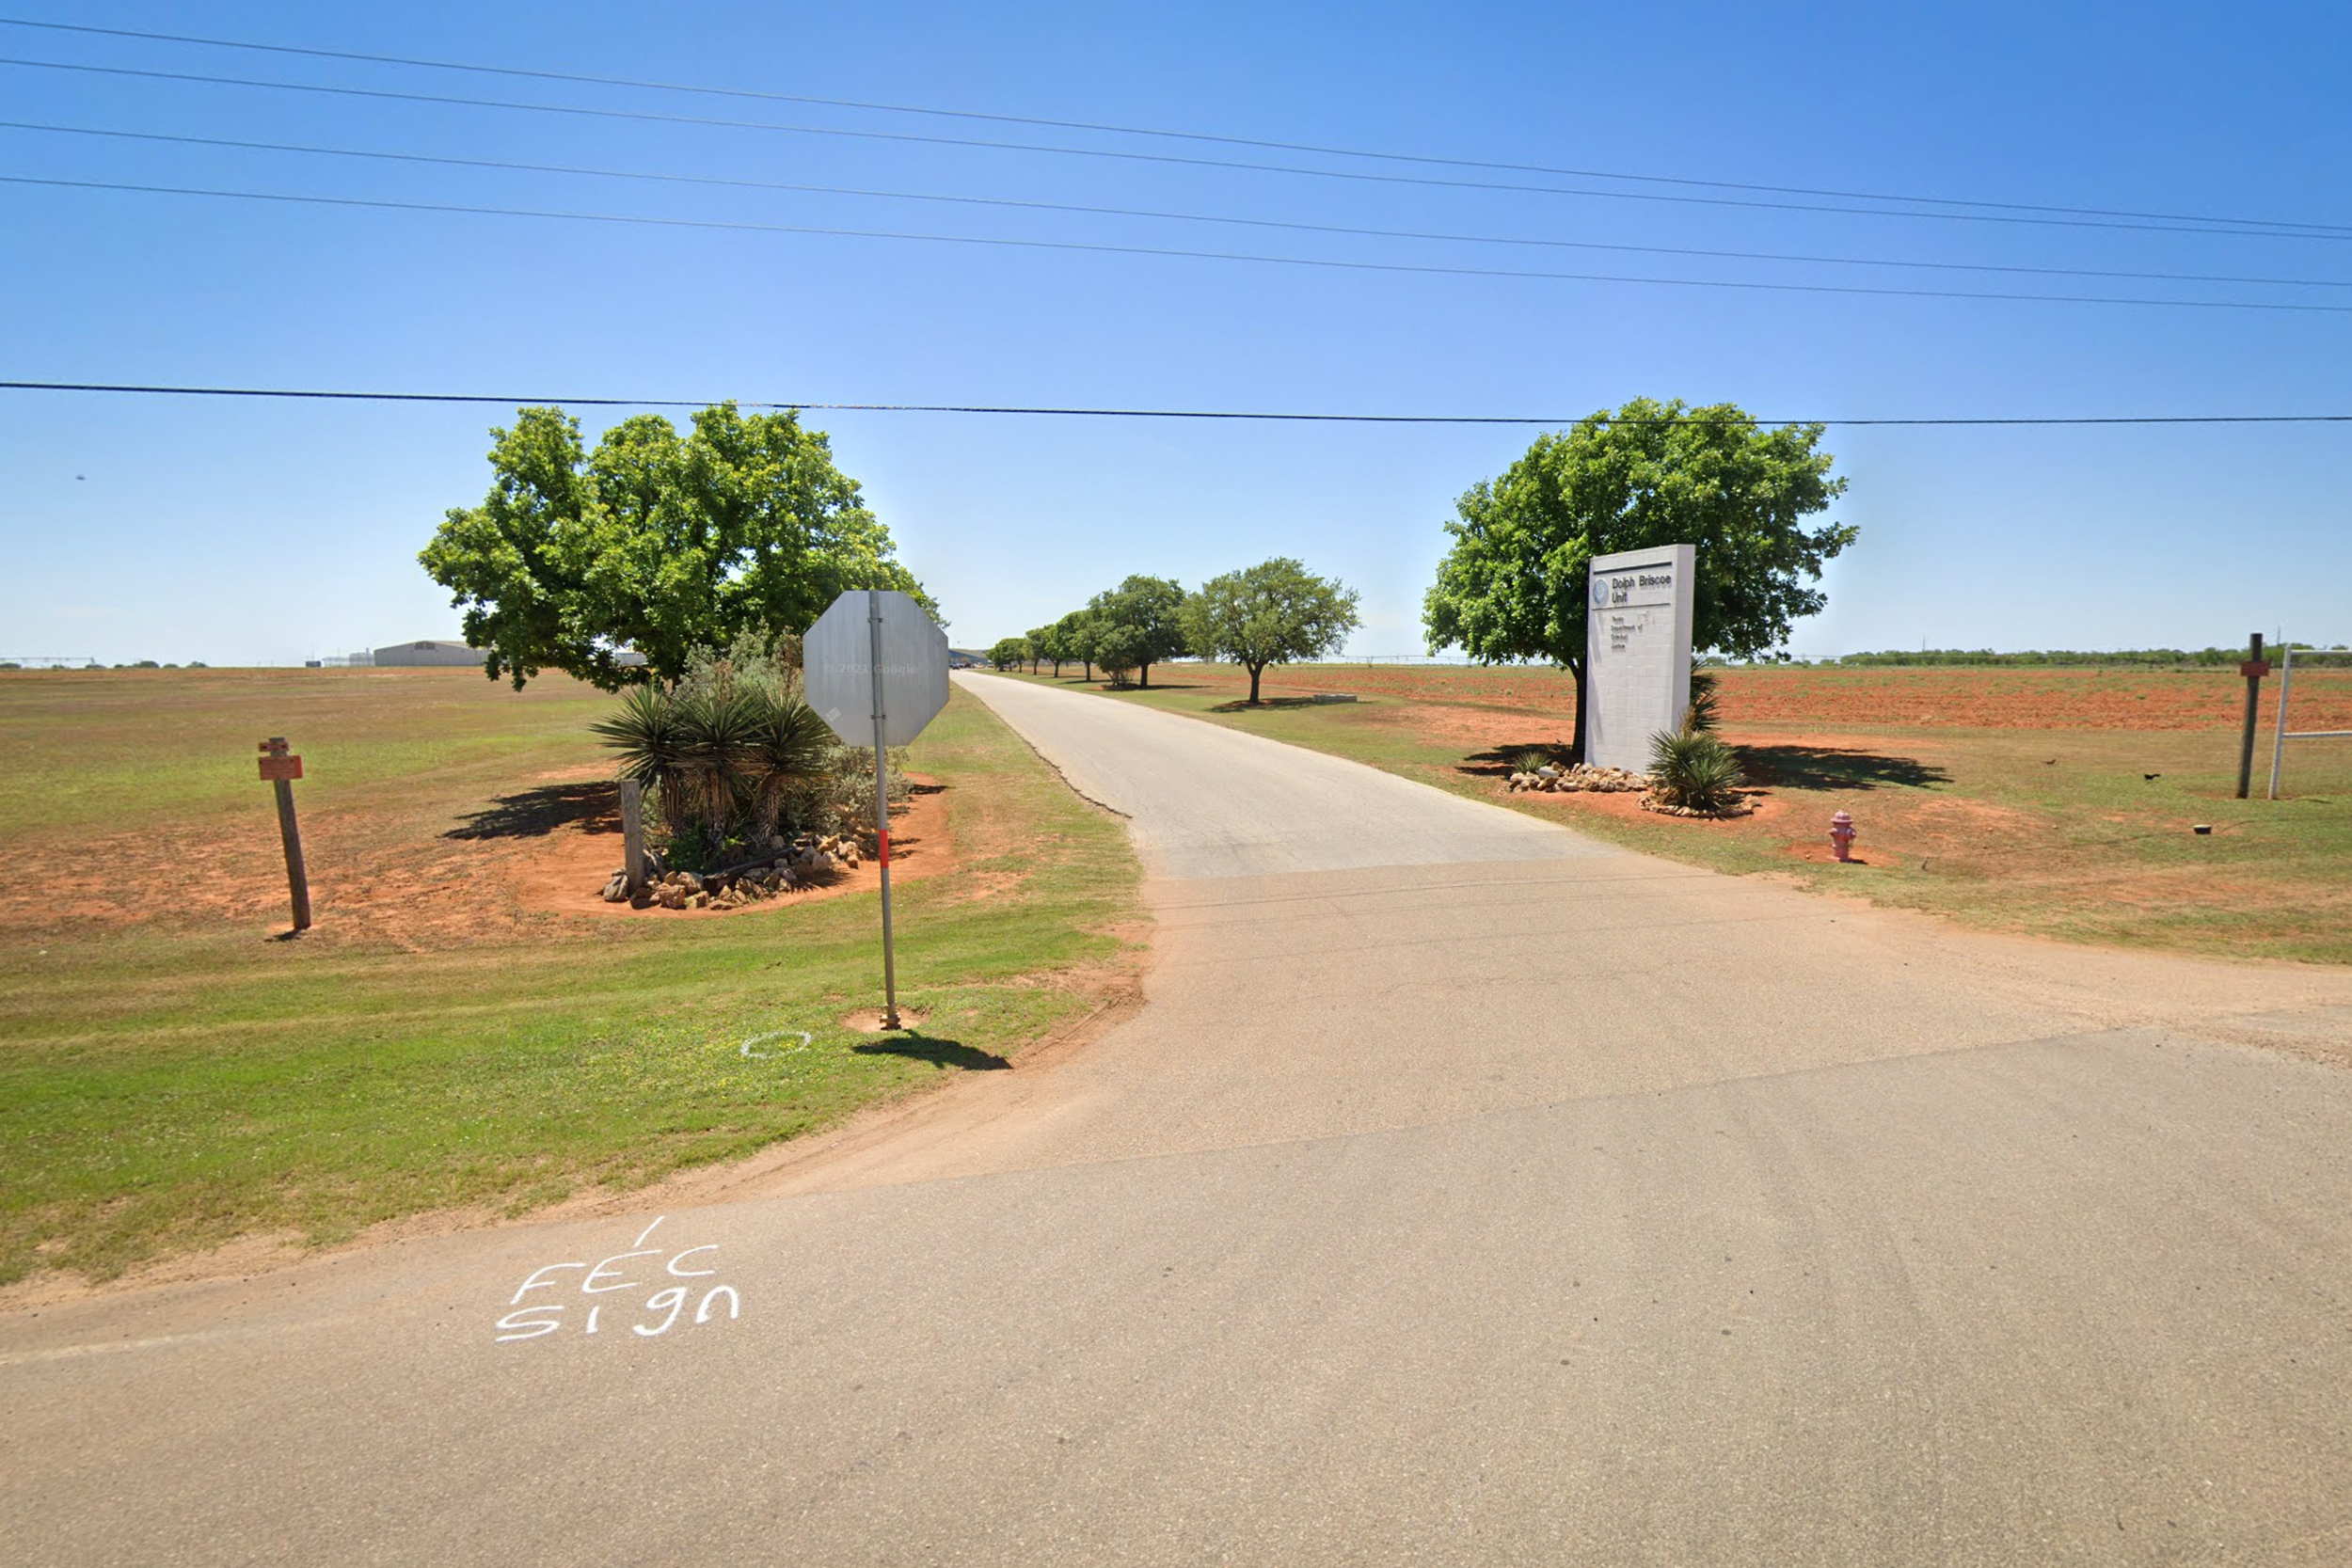 Texas prison officials stall release of migrants despite judge's order